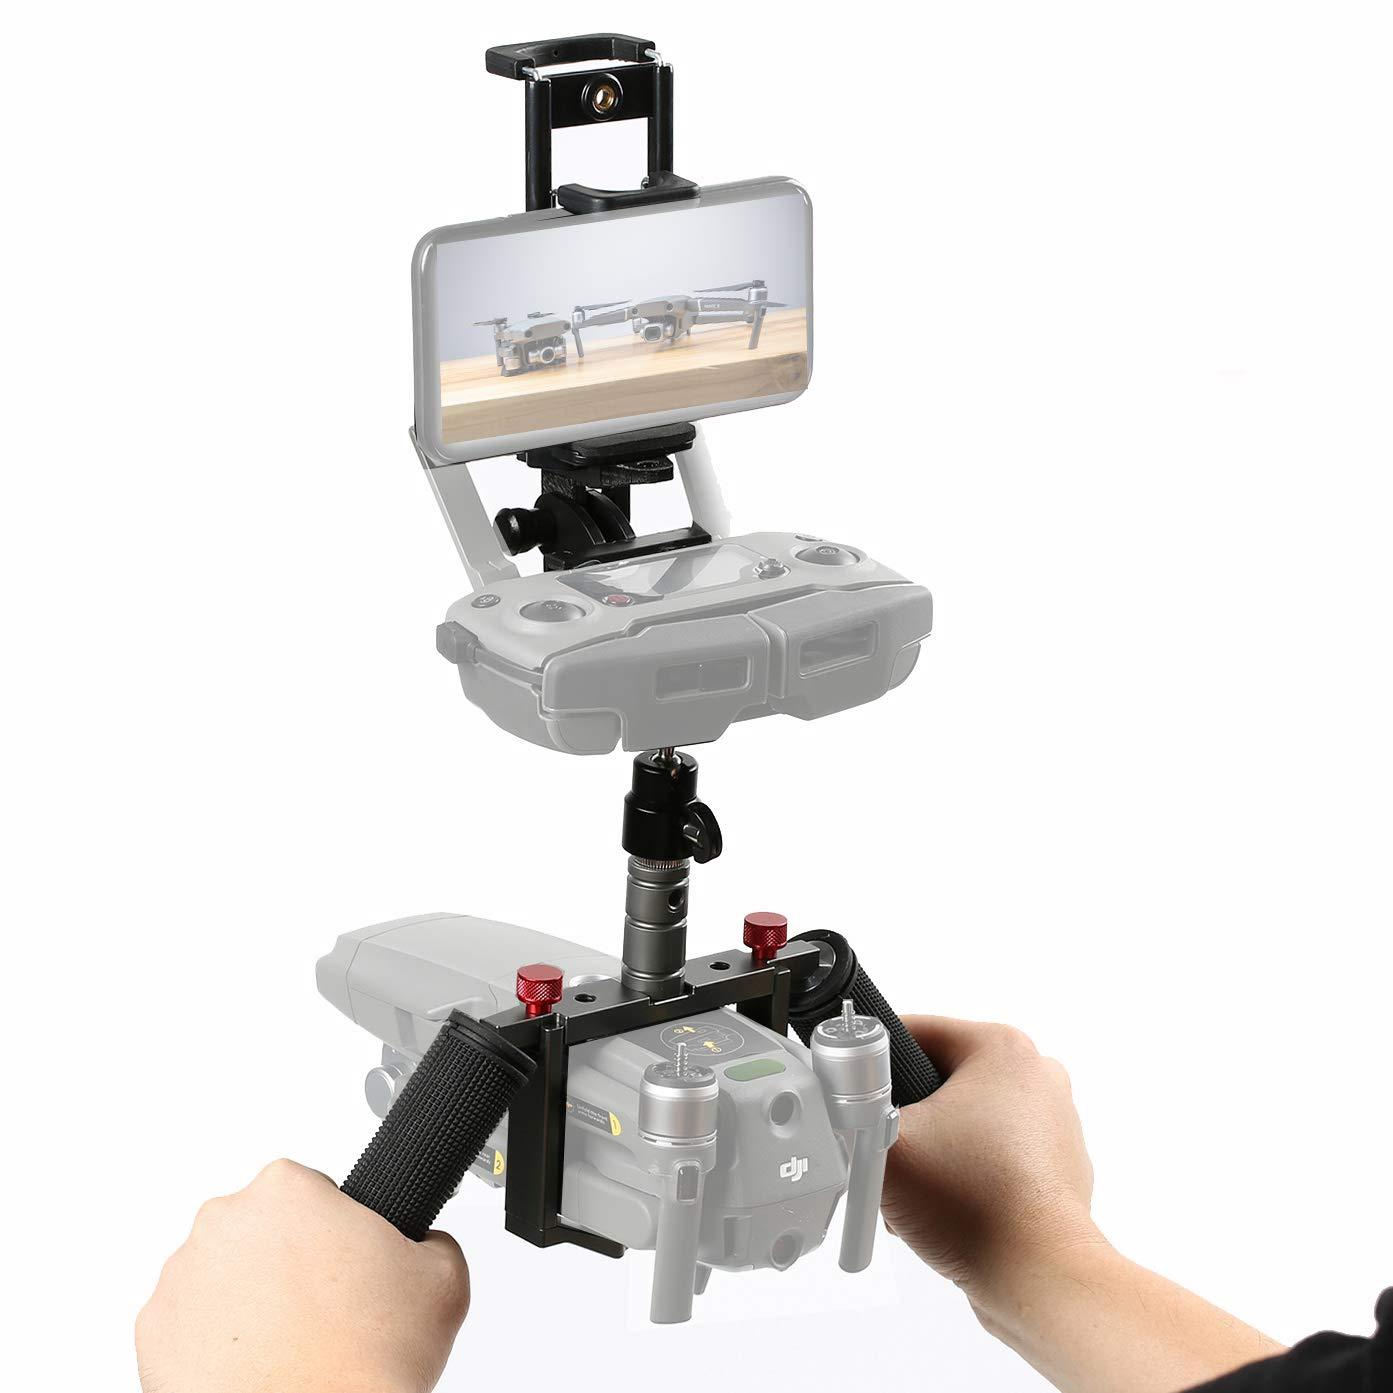 Cinema Tray, FOTOWELT Metal Handheld Tray Stabilizer Bracket Kit Compatible with DJI Mavic 2 pro/Zoom